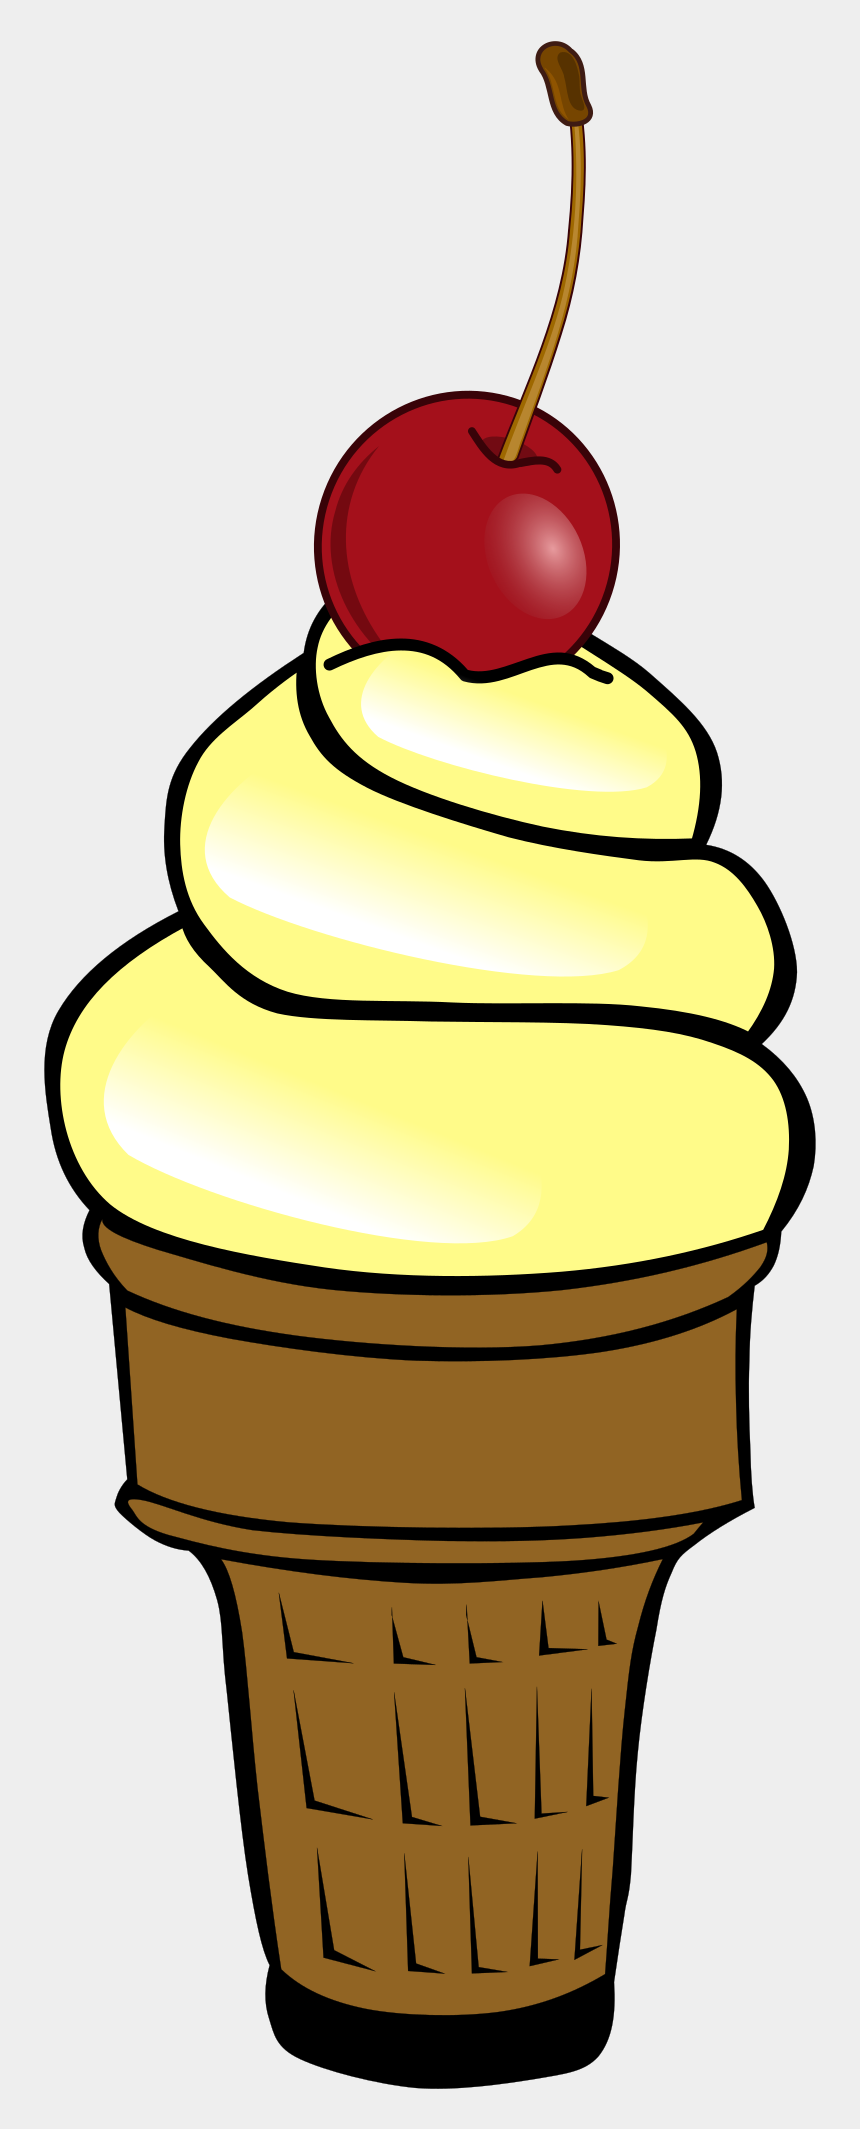 ice cream clipart, Cartoons - Soft Ice Cream With Cherry - Ice Cream Cone Candyland